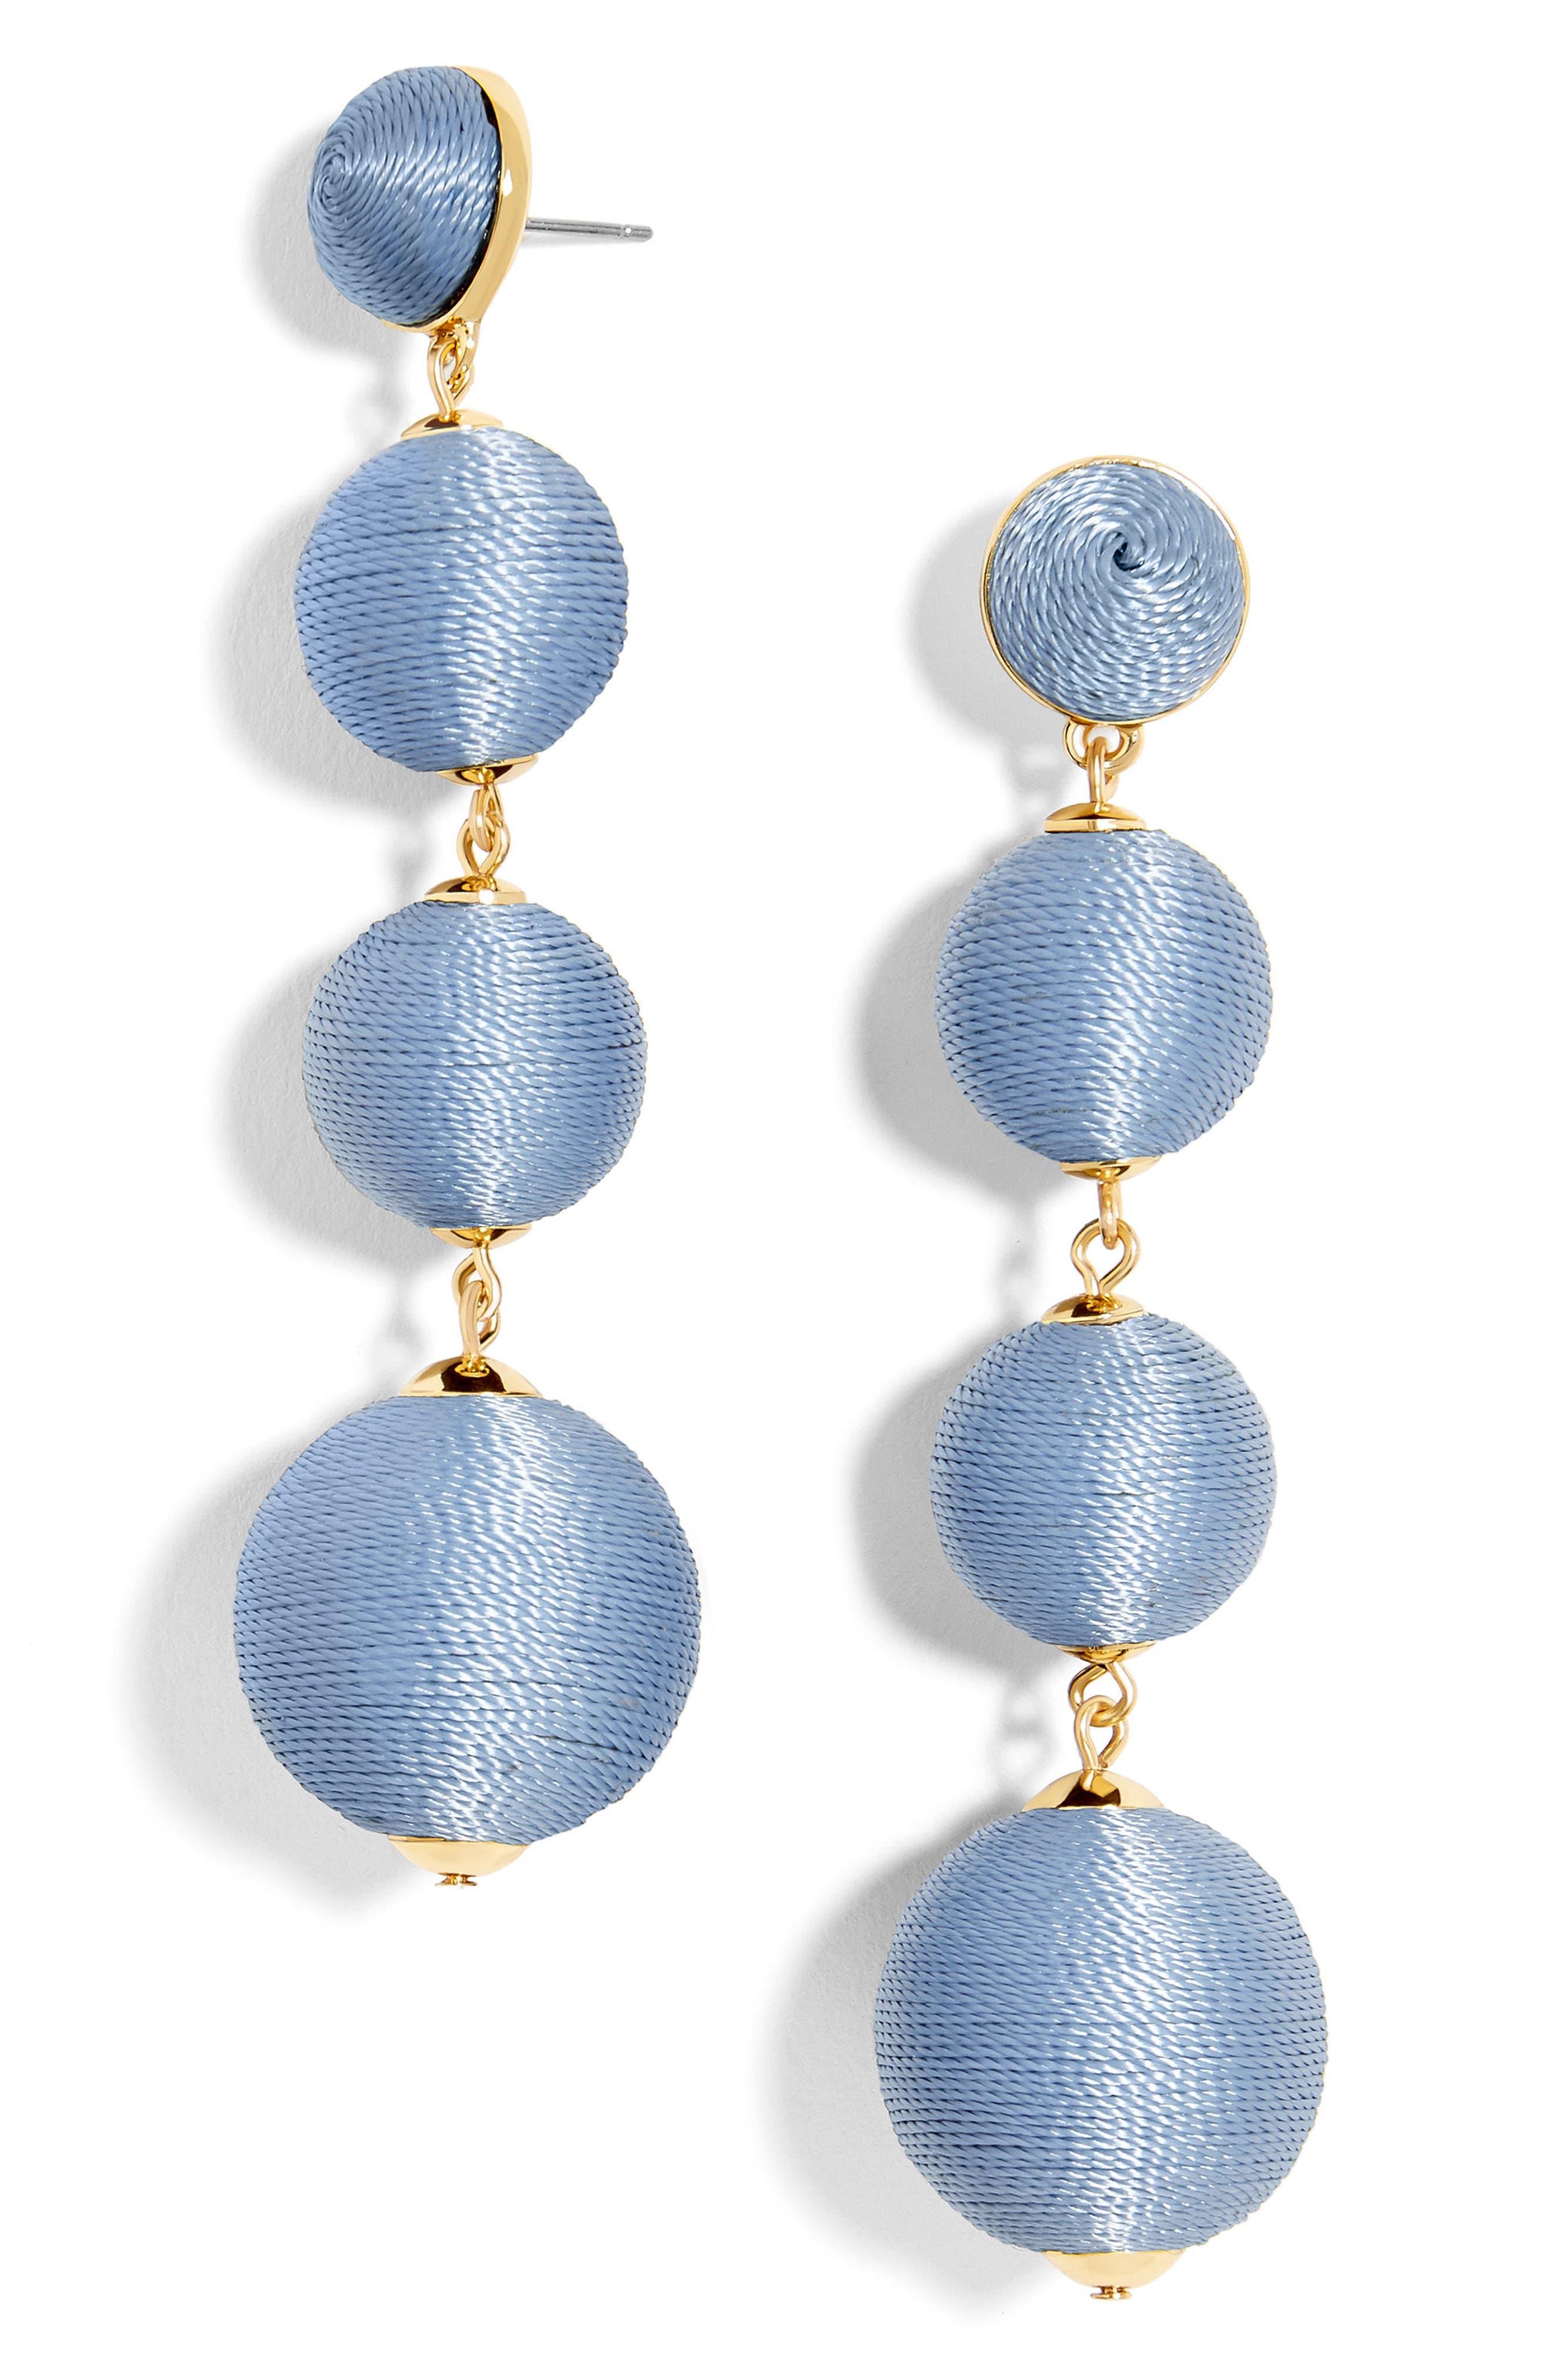 Criselda Ball Shoulder Duster Earrings,                             Main thumbnail 6, color,